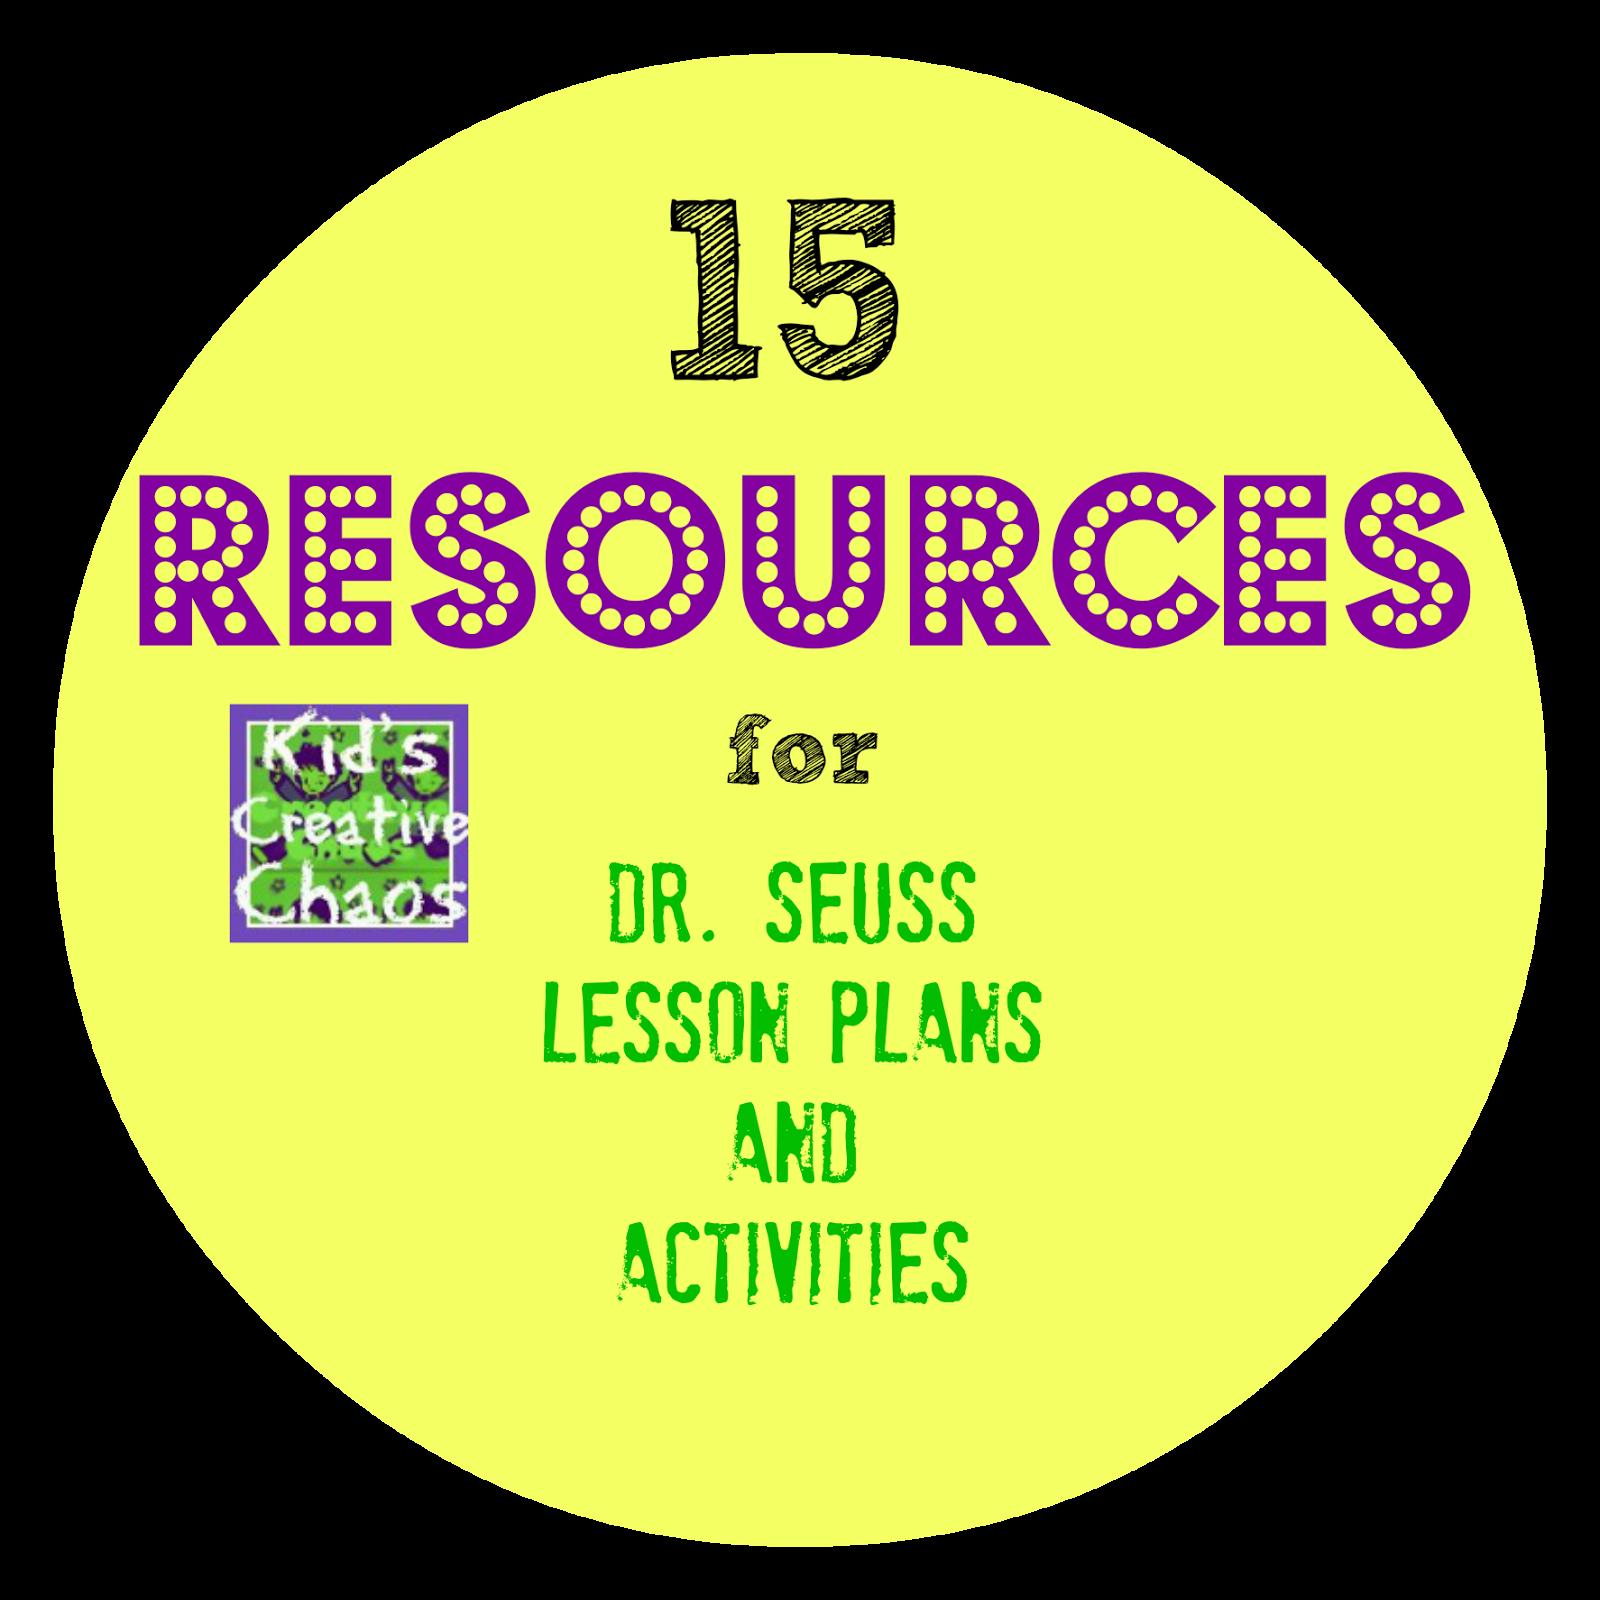 15 Resources For Dr Seuss Lesson Plans Elementary School